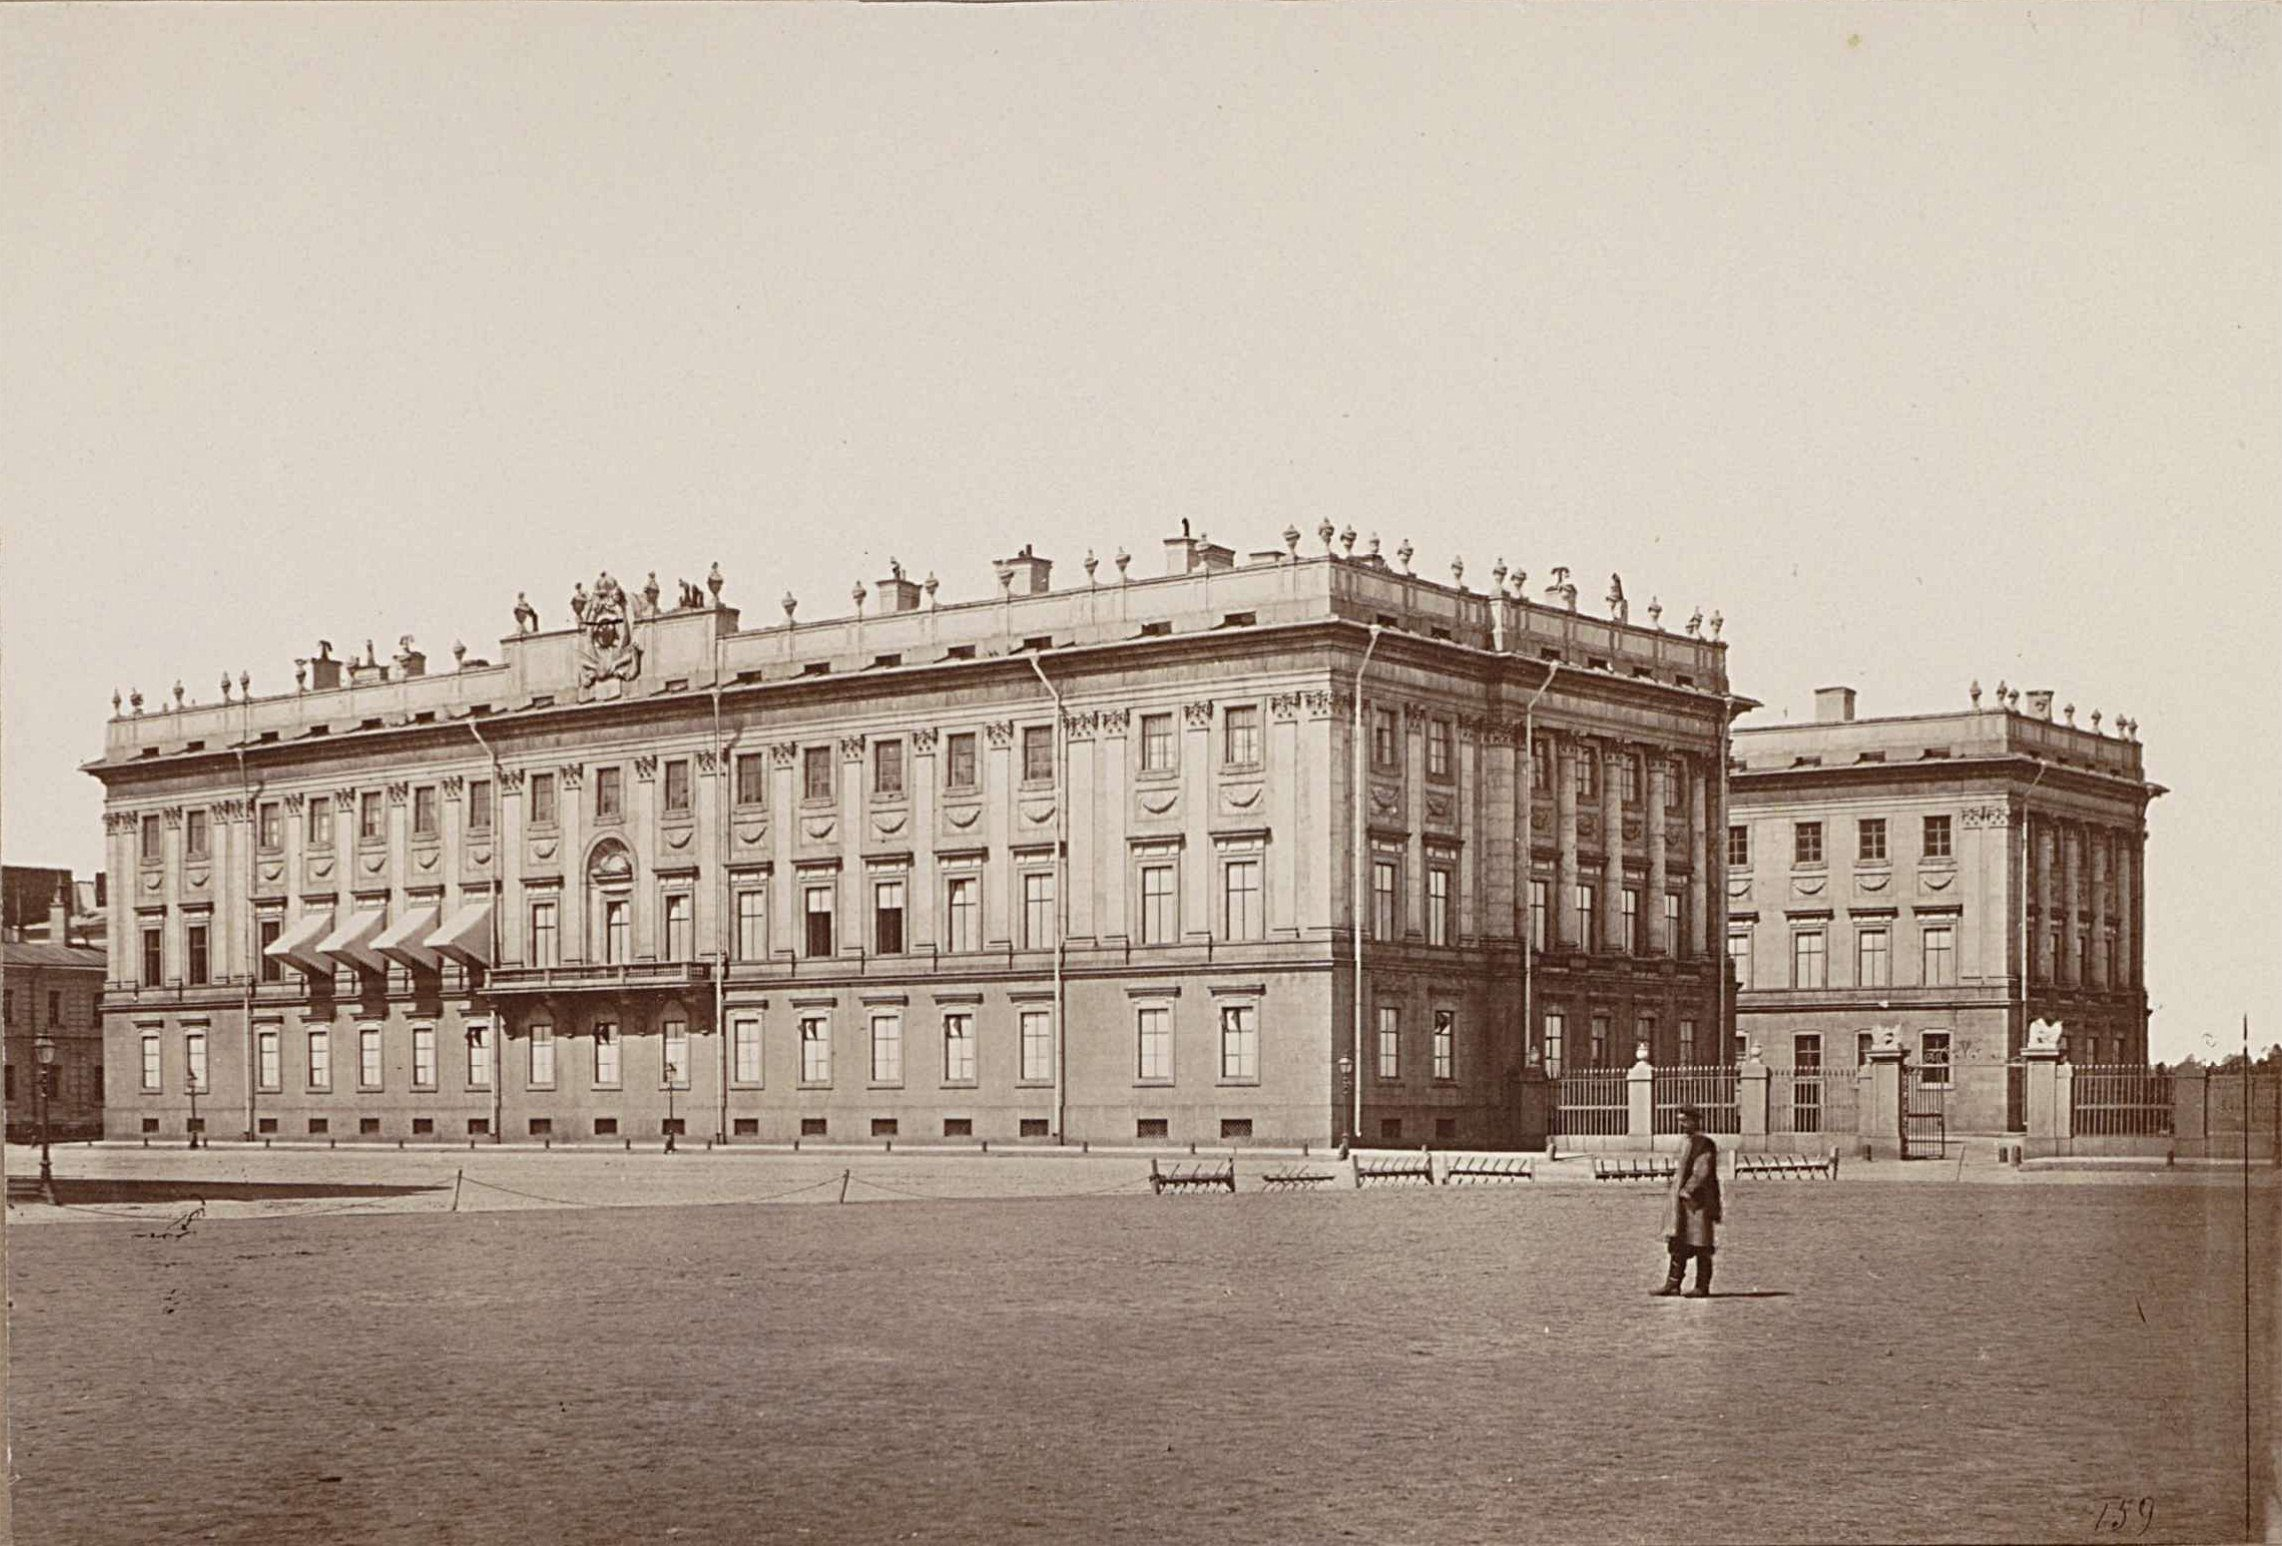 История мраморного дворца, фото 1865-1869